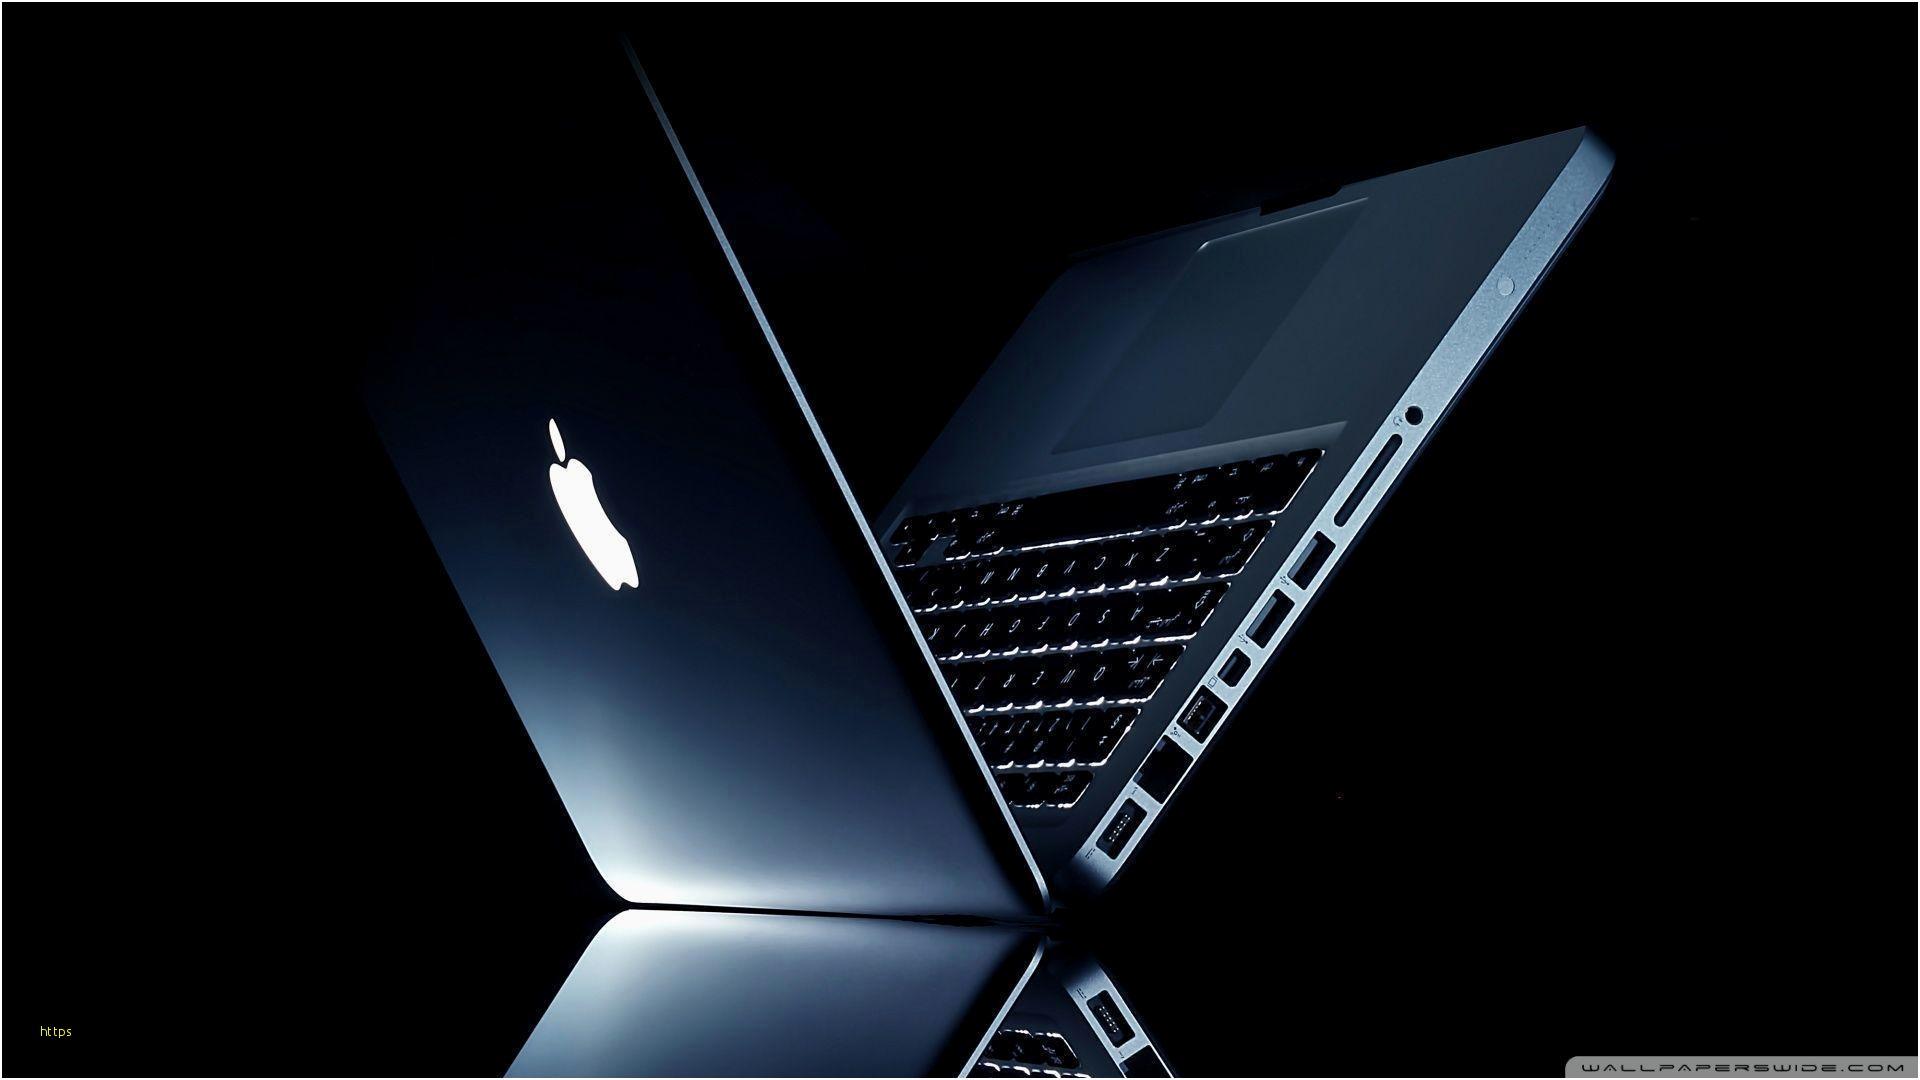 Macbook Pro Wallpaper Best Of Macbook Pro Wallpapers - High Resolution Wallpaper For Laptop , HD Wallpaper & Backgrounds